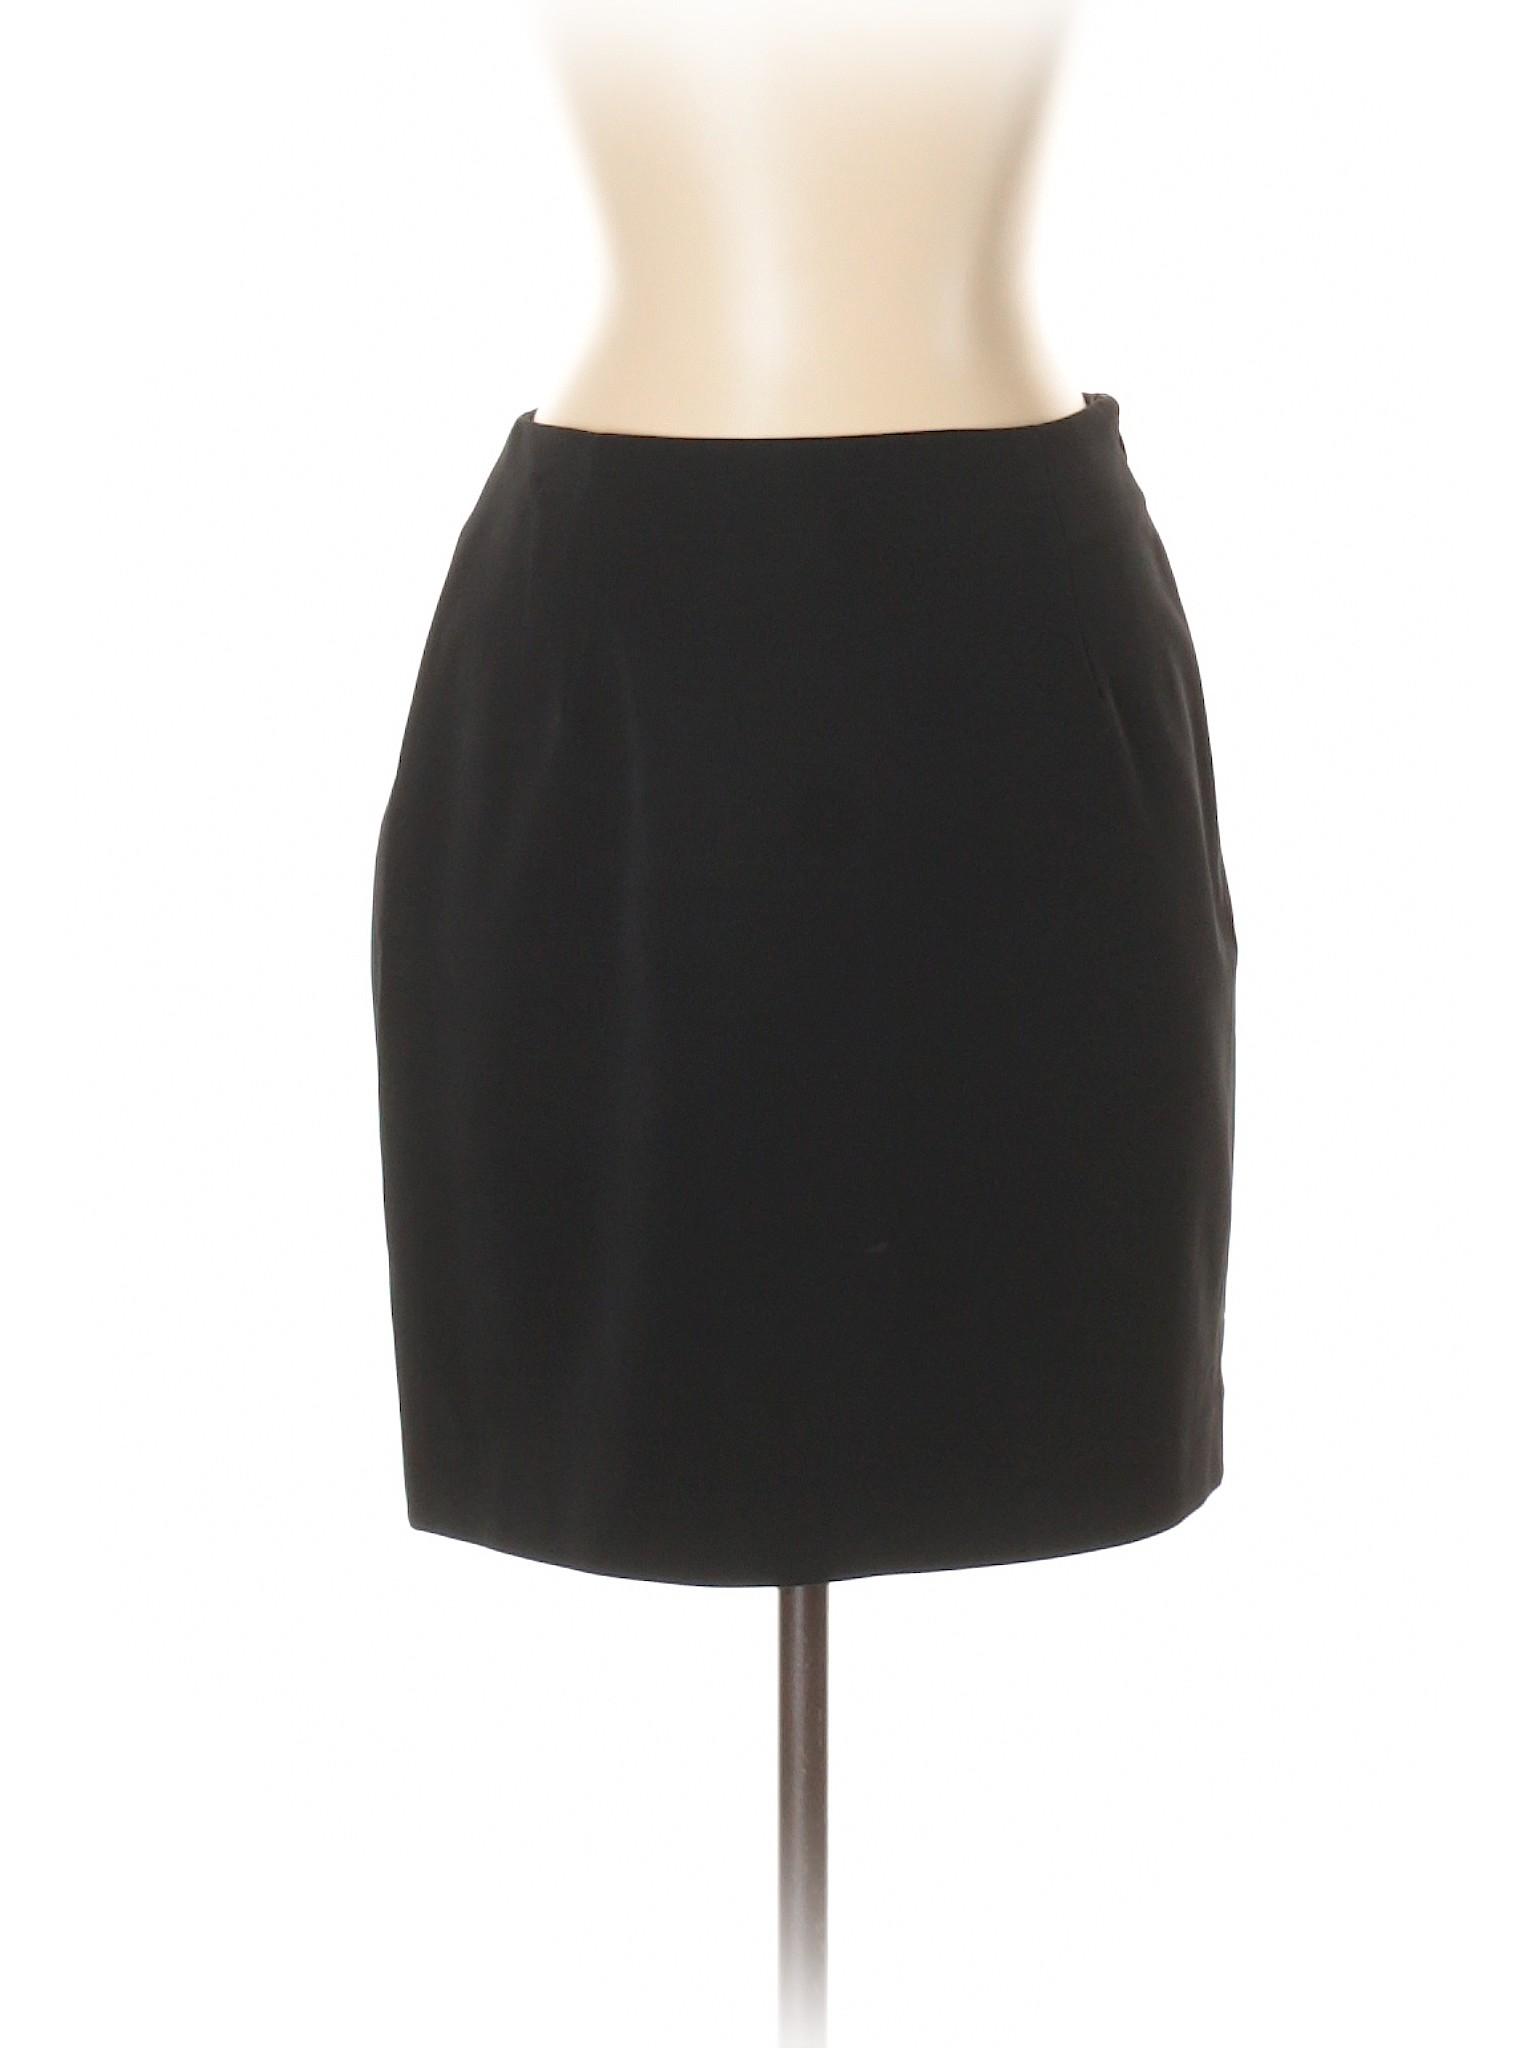 Casual Skirt Boutique Casual Boutique Casual Boutique Casual Skirt Boutique Skirt Casual Casual Skirt Boutique Skirt Skirt Boutique xA7O7qIwn